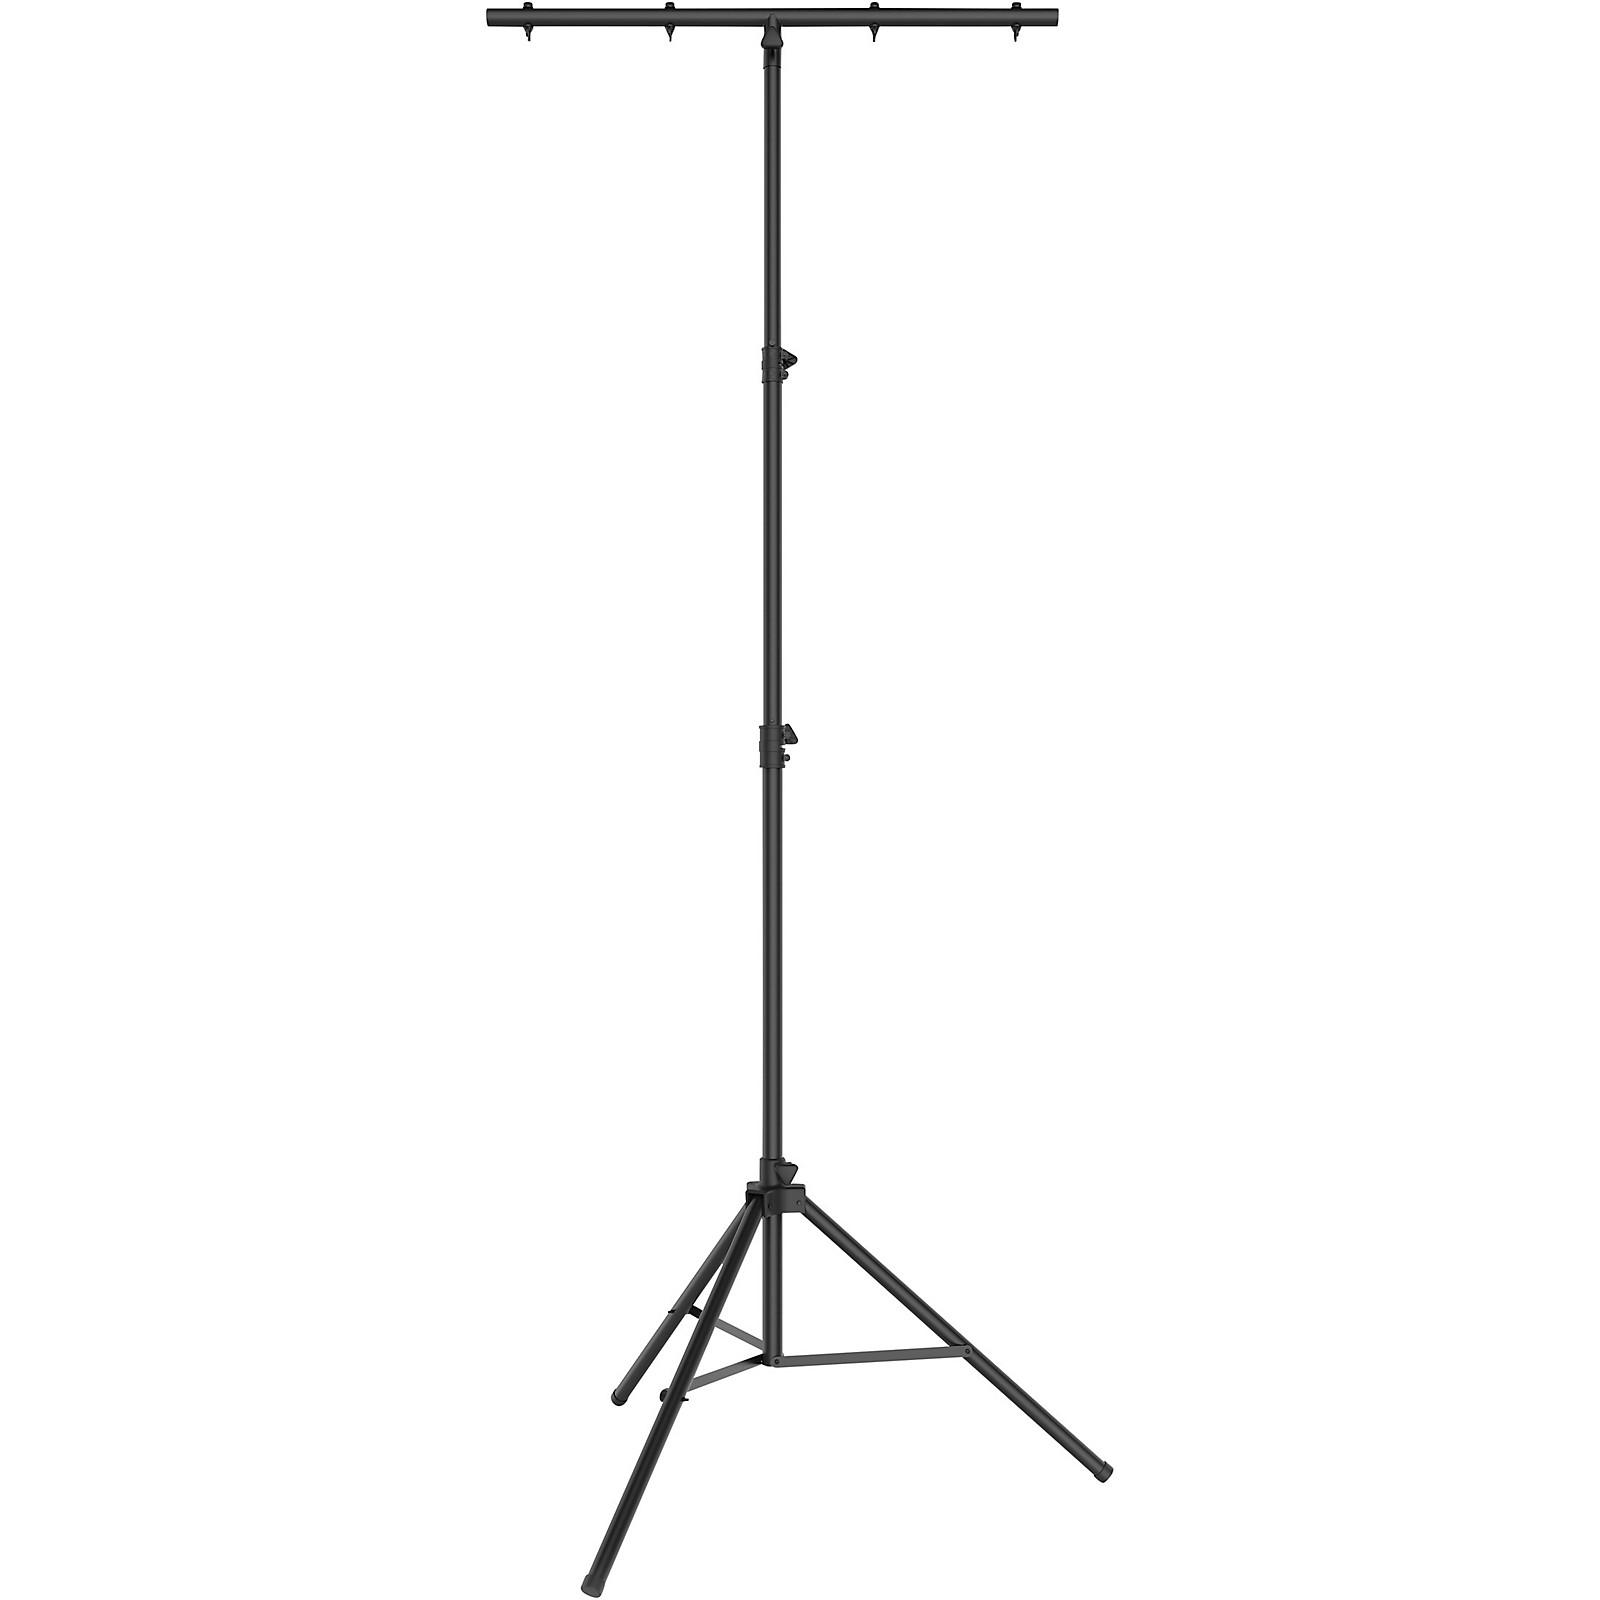 CHAUVET DJ CH-03 Heavy-duty T-bar Mobile Lighting Stand